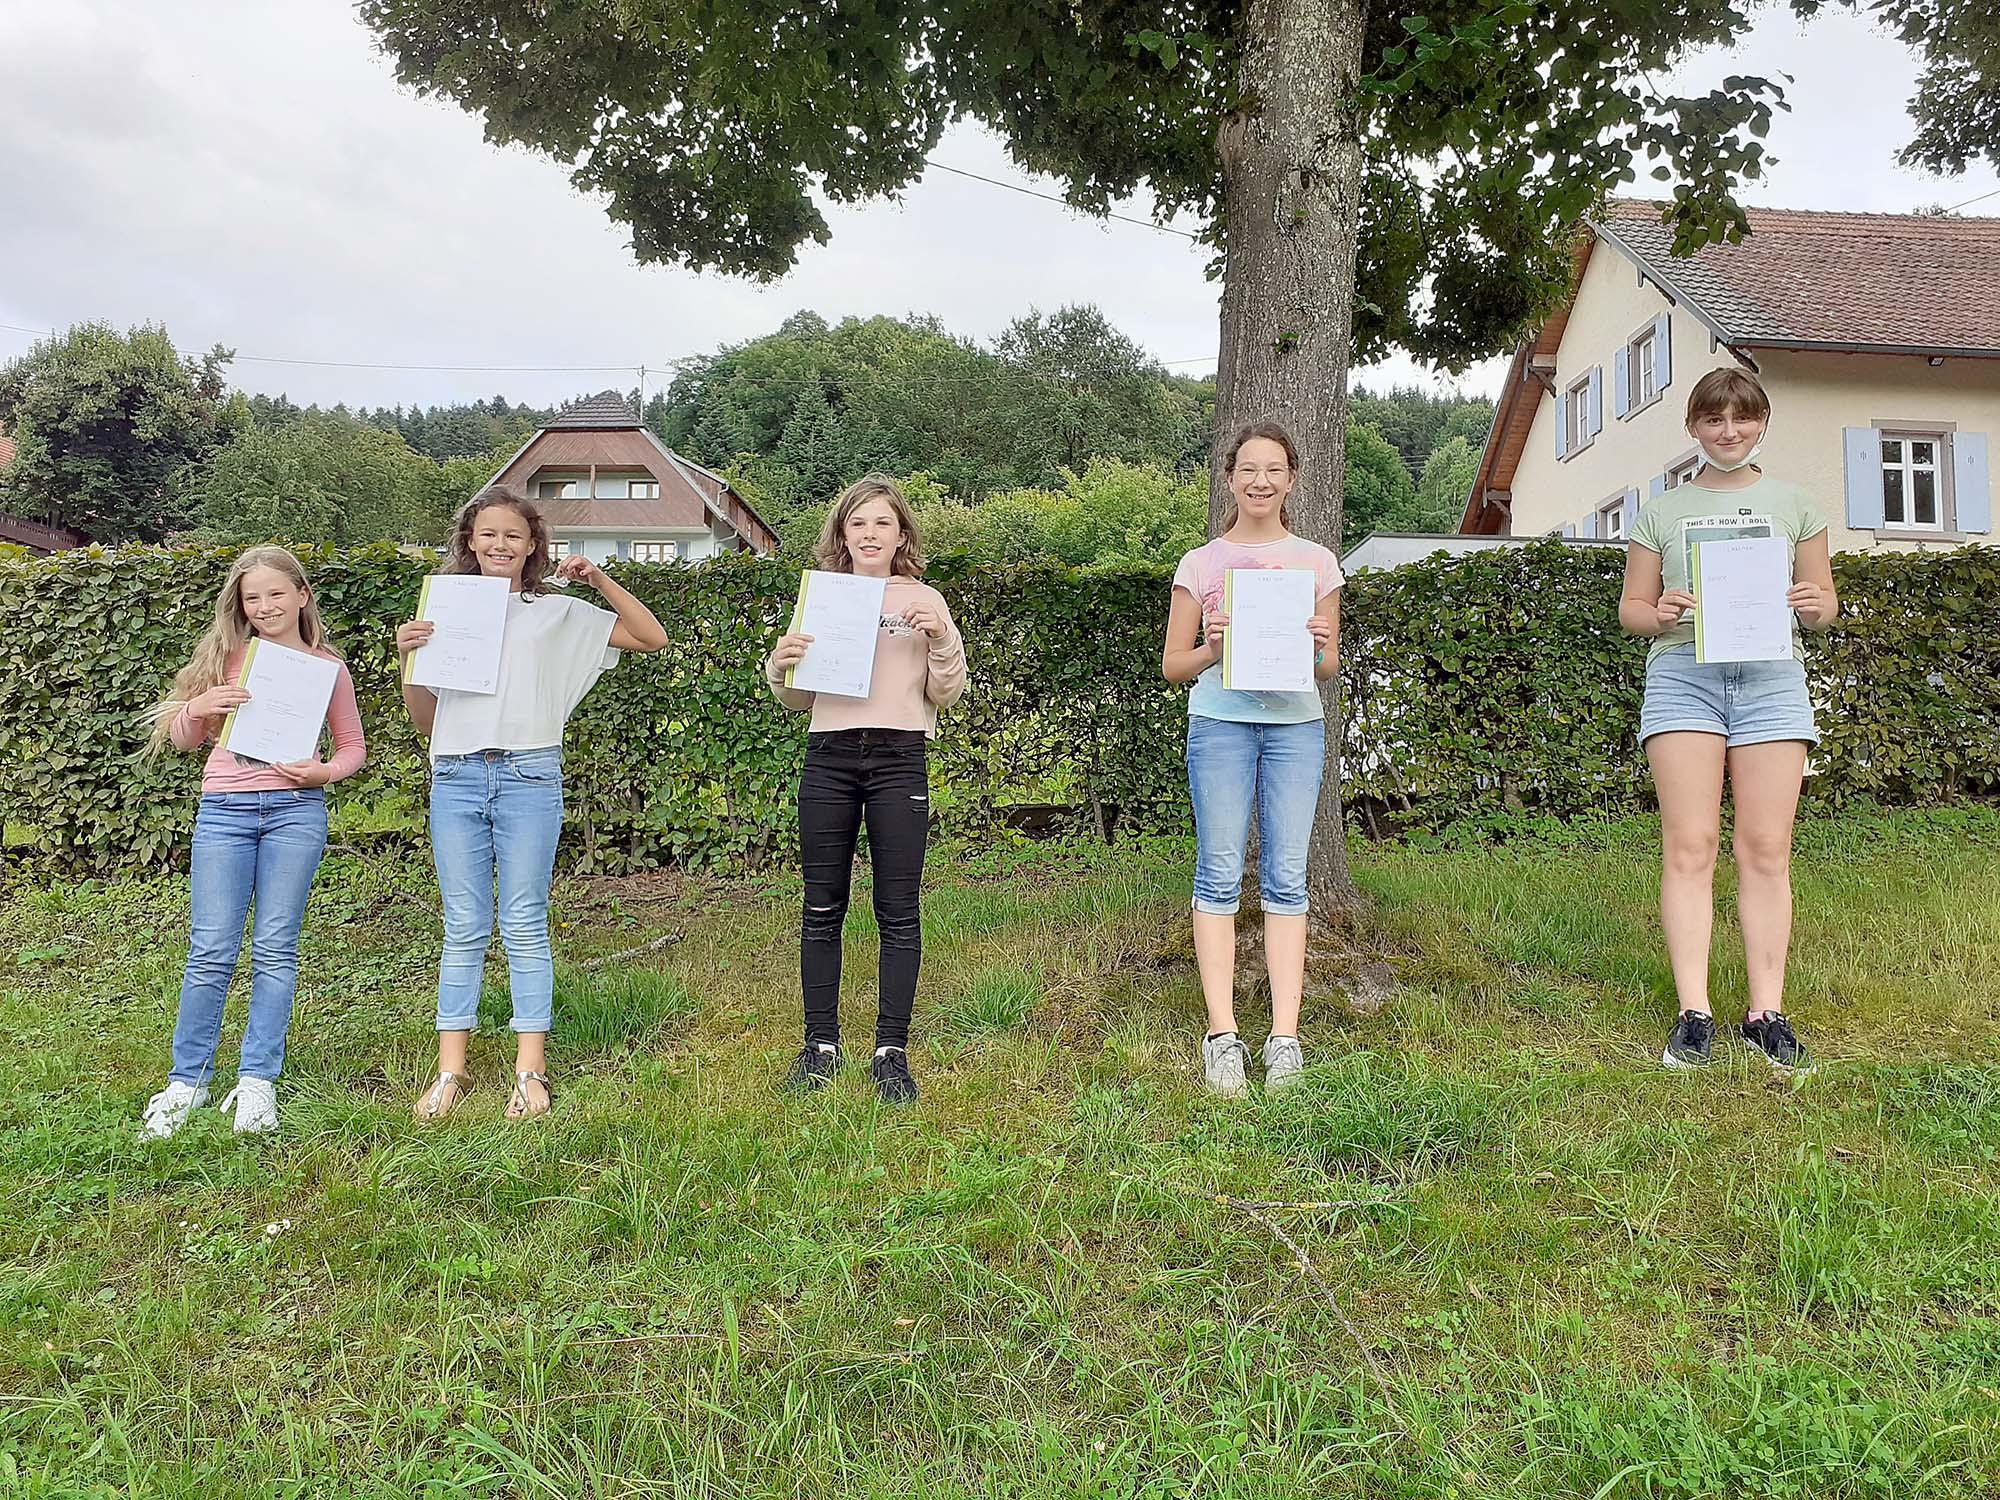 2021-8-9-BI-PB-Bläserjugend-Junior Jungmusikerleistungsabzeichen-20210806_182542-NEU